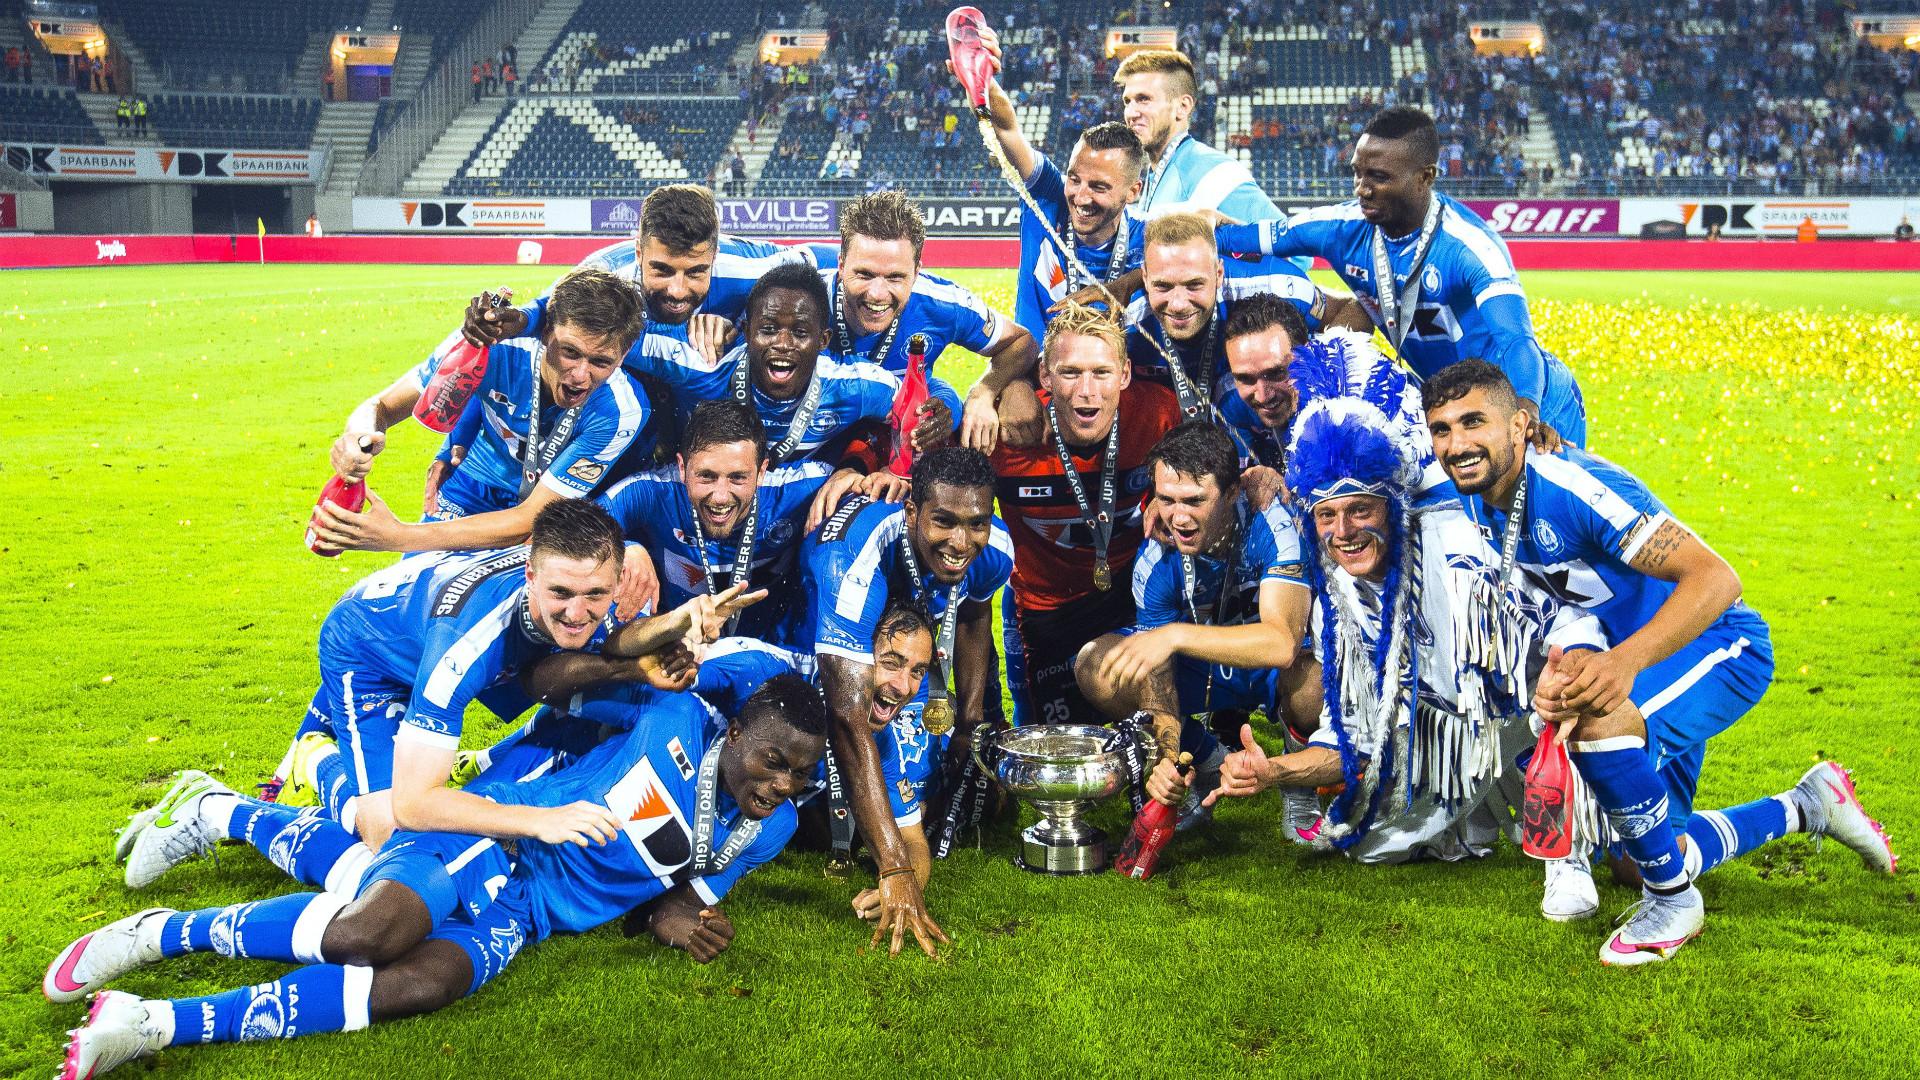 Kaa Gent Supercup Goalcom